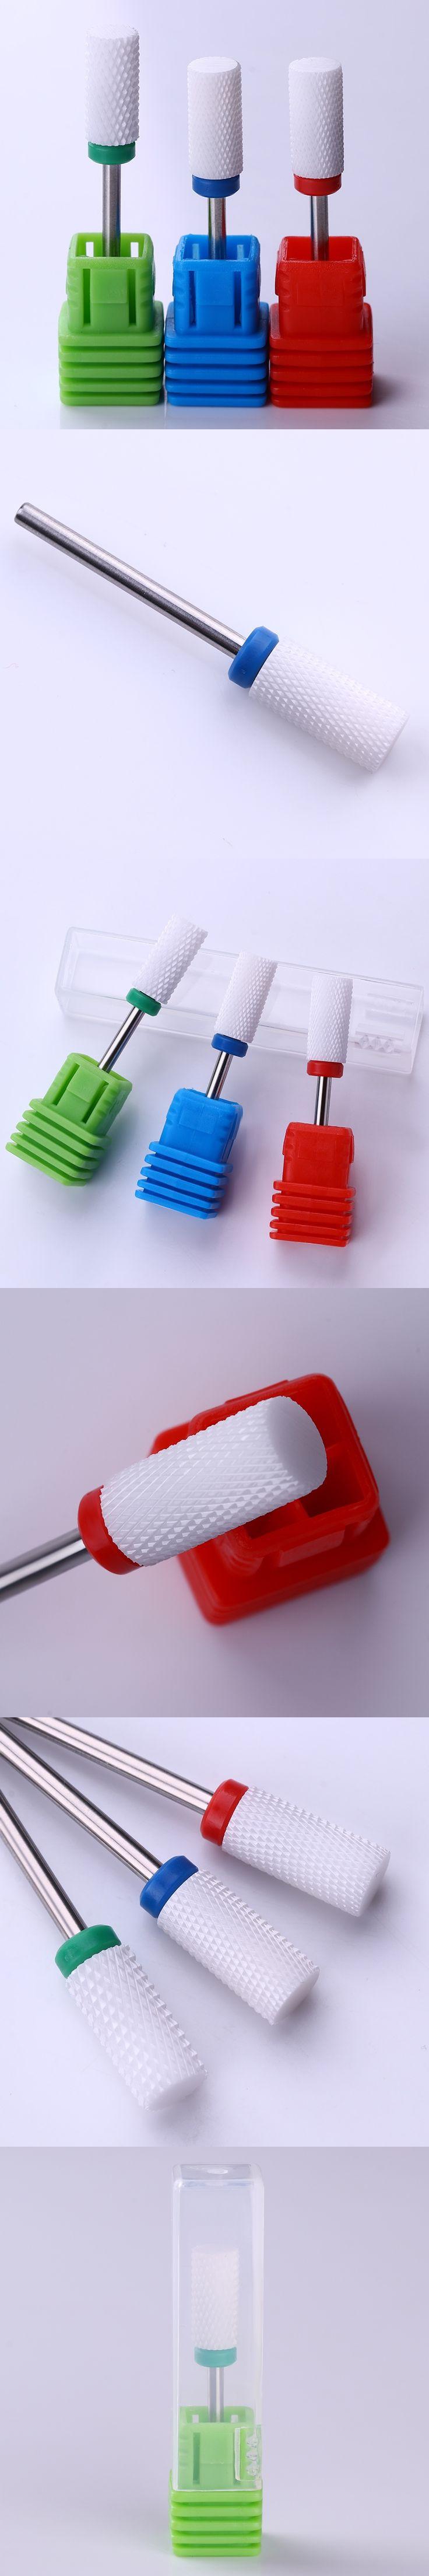 Ceramic Nail Drill Bit Mill File for Electric Drill Machine Accessories Manicure Nail Art Tools